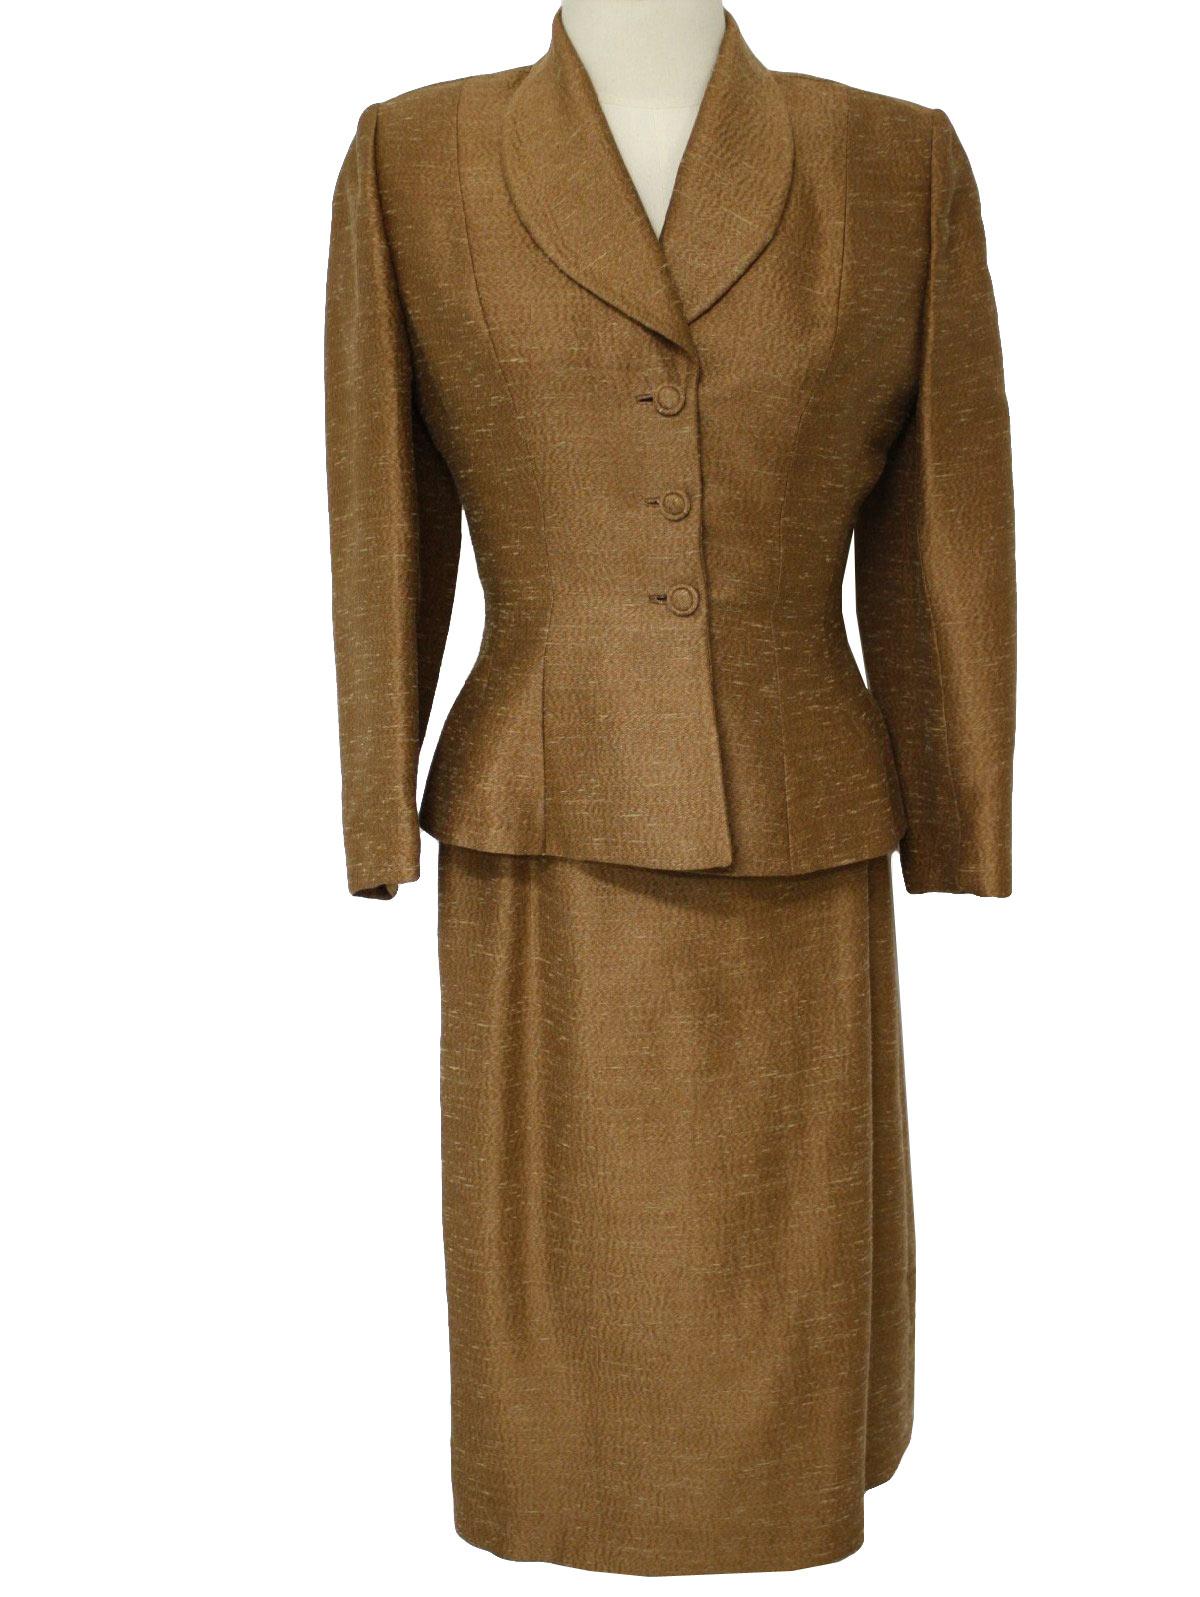 50s Suit Lilli Annette Diminutive Lilli Ann Designer 50s Lilli